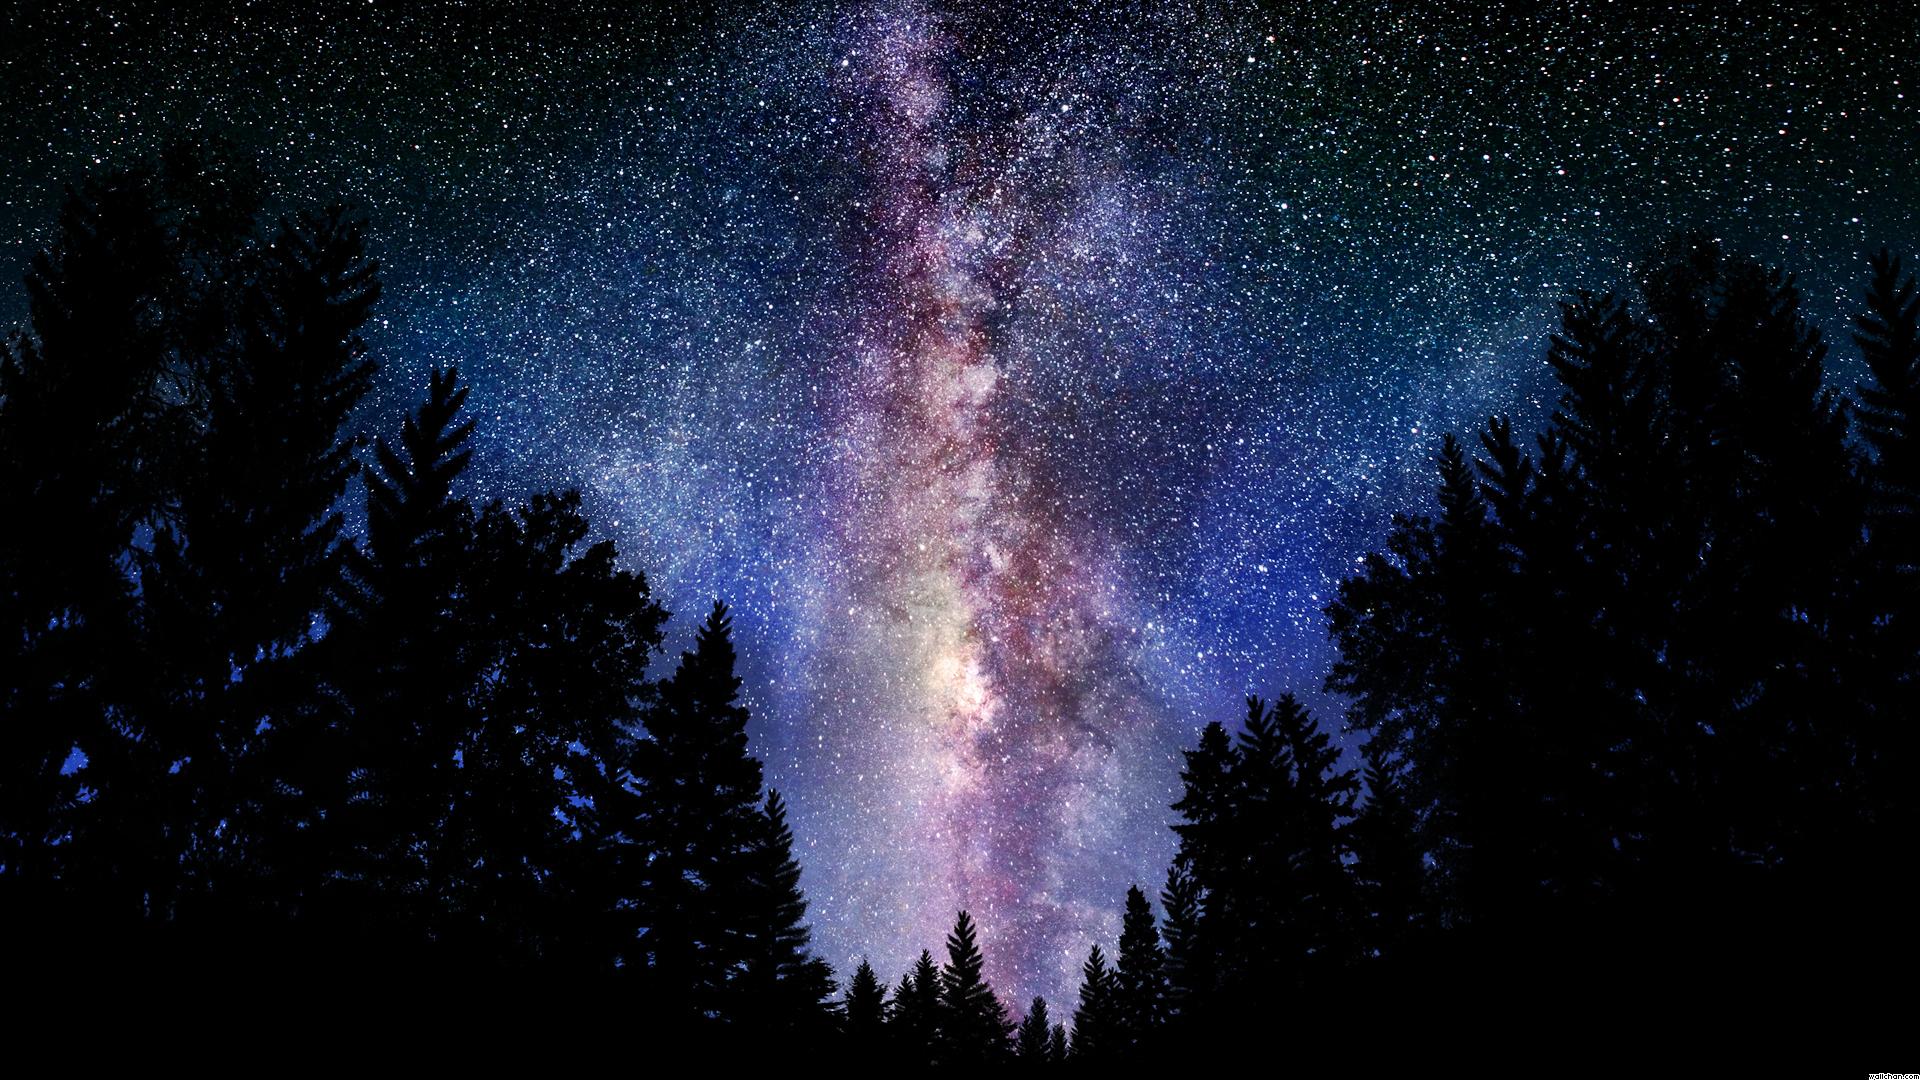 Galaxy Space Live Wallpapers Hd By Narendra Doriya: Live Milky Way Galaxy Wallpaper